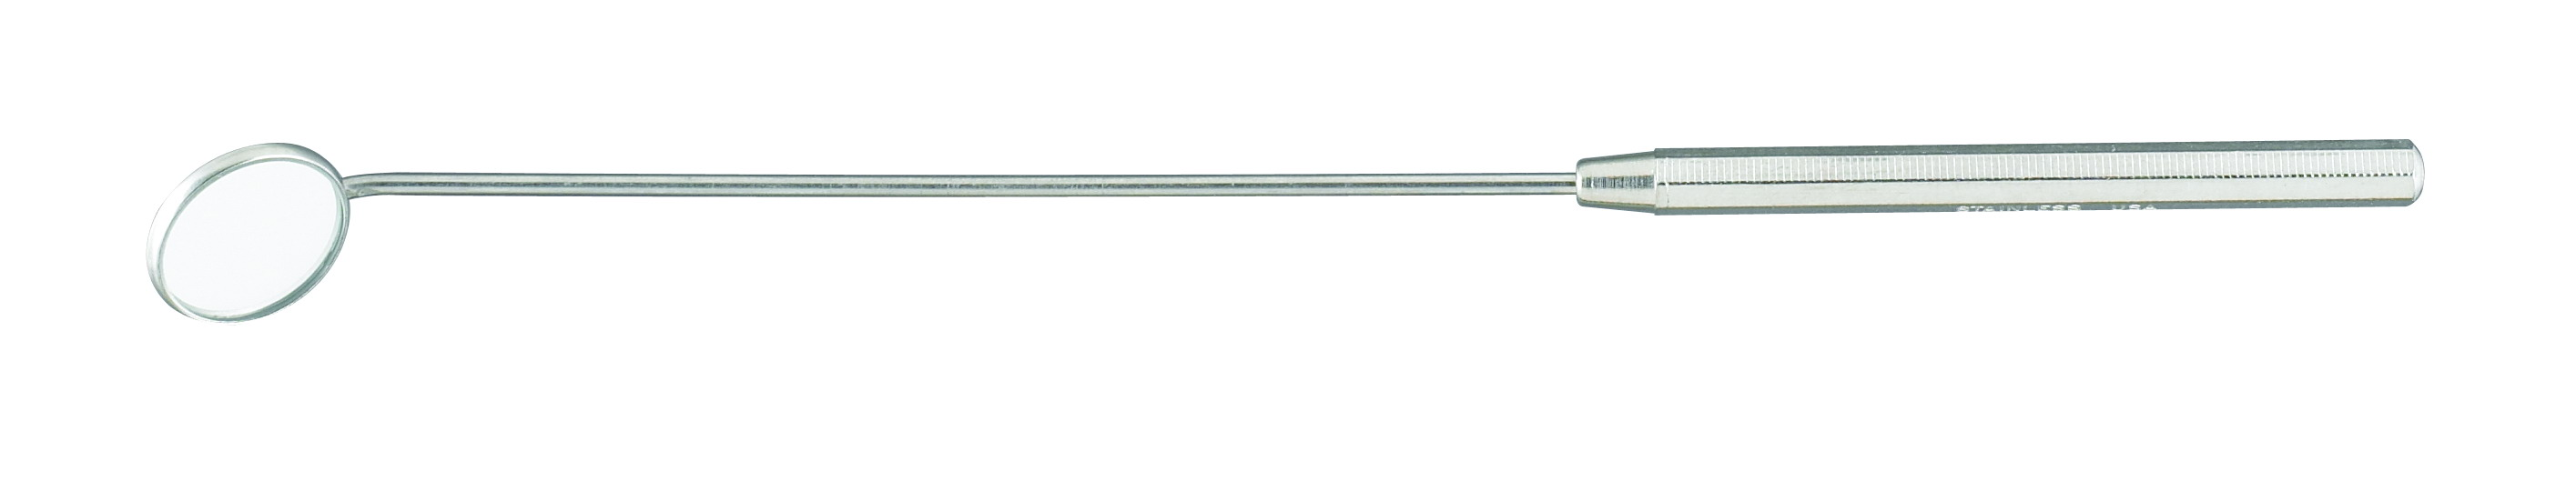 laryngeal-mirror-size-2-with-octagon-threaded-handle-18-mm-23-8-2-miltex.jpg